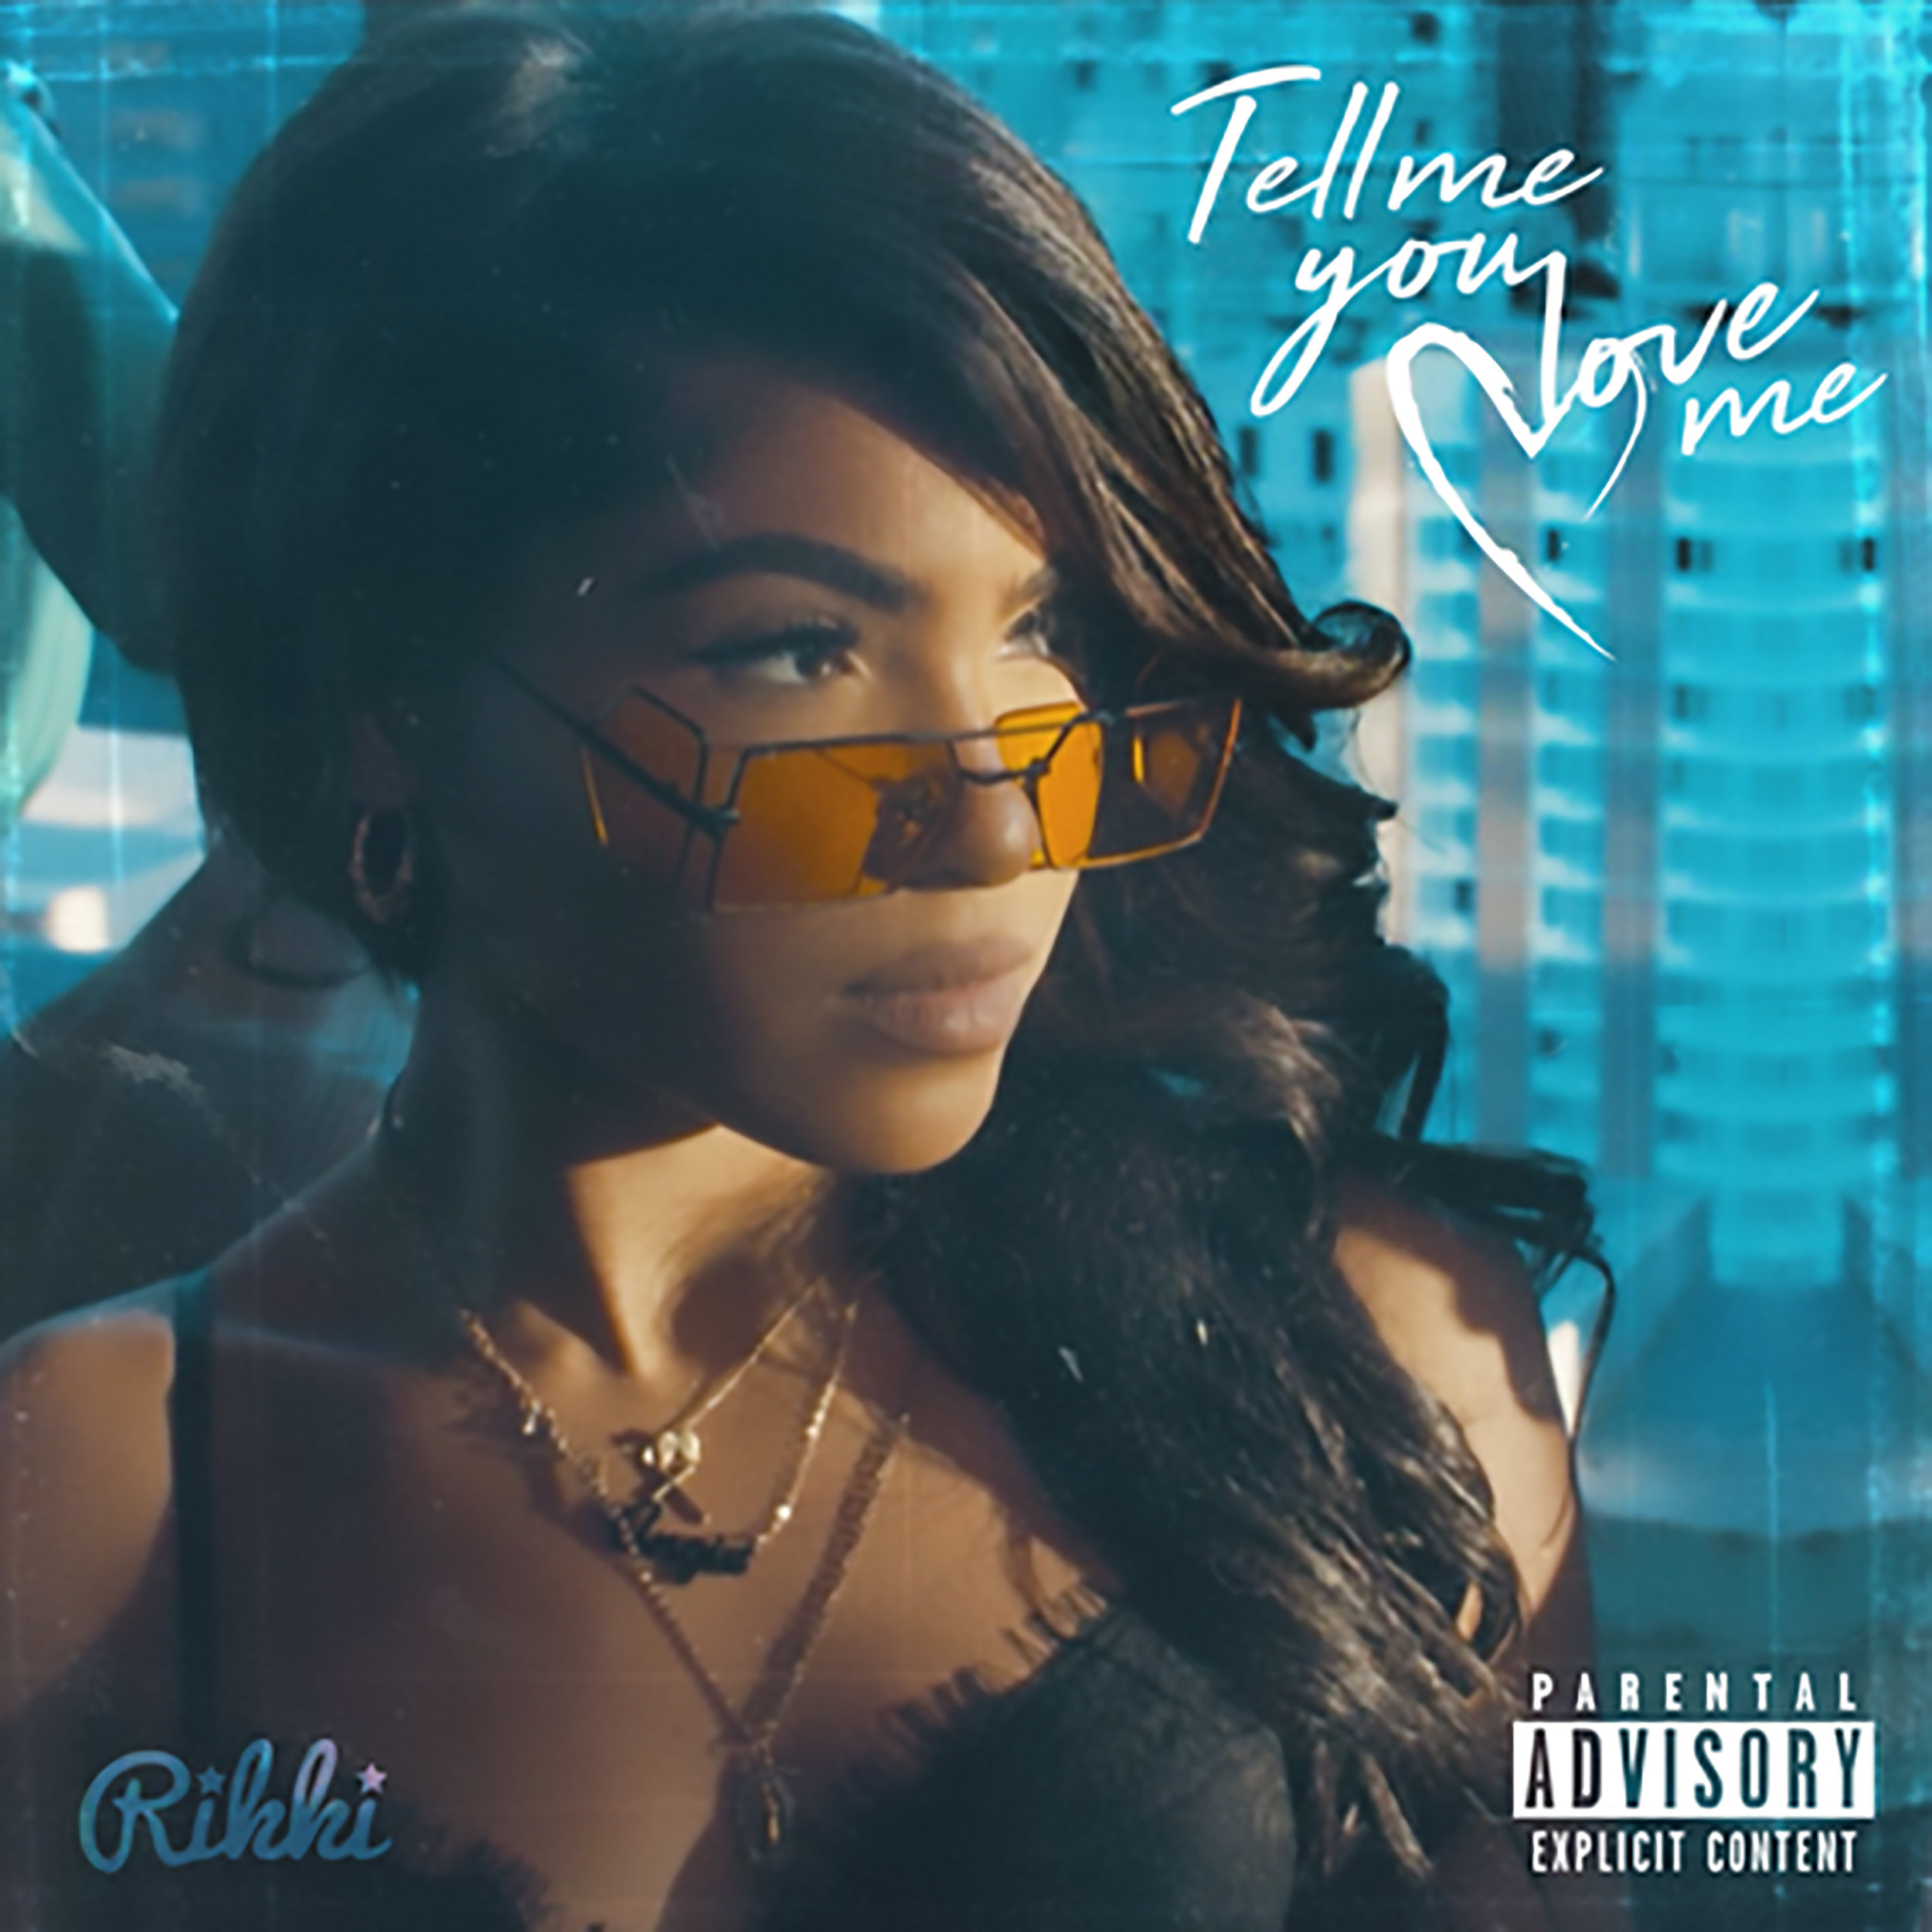 Rikki Woodlin - Tell Me You Love Me - Single cover.jpg